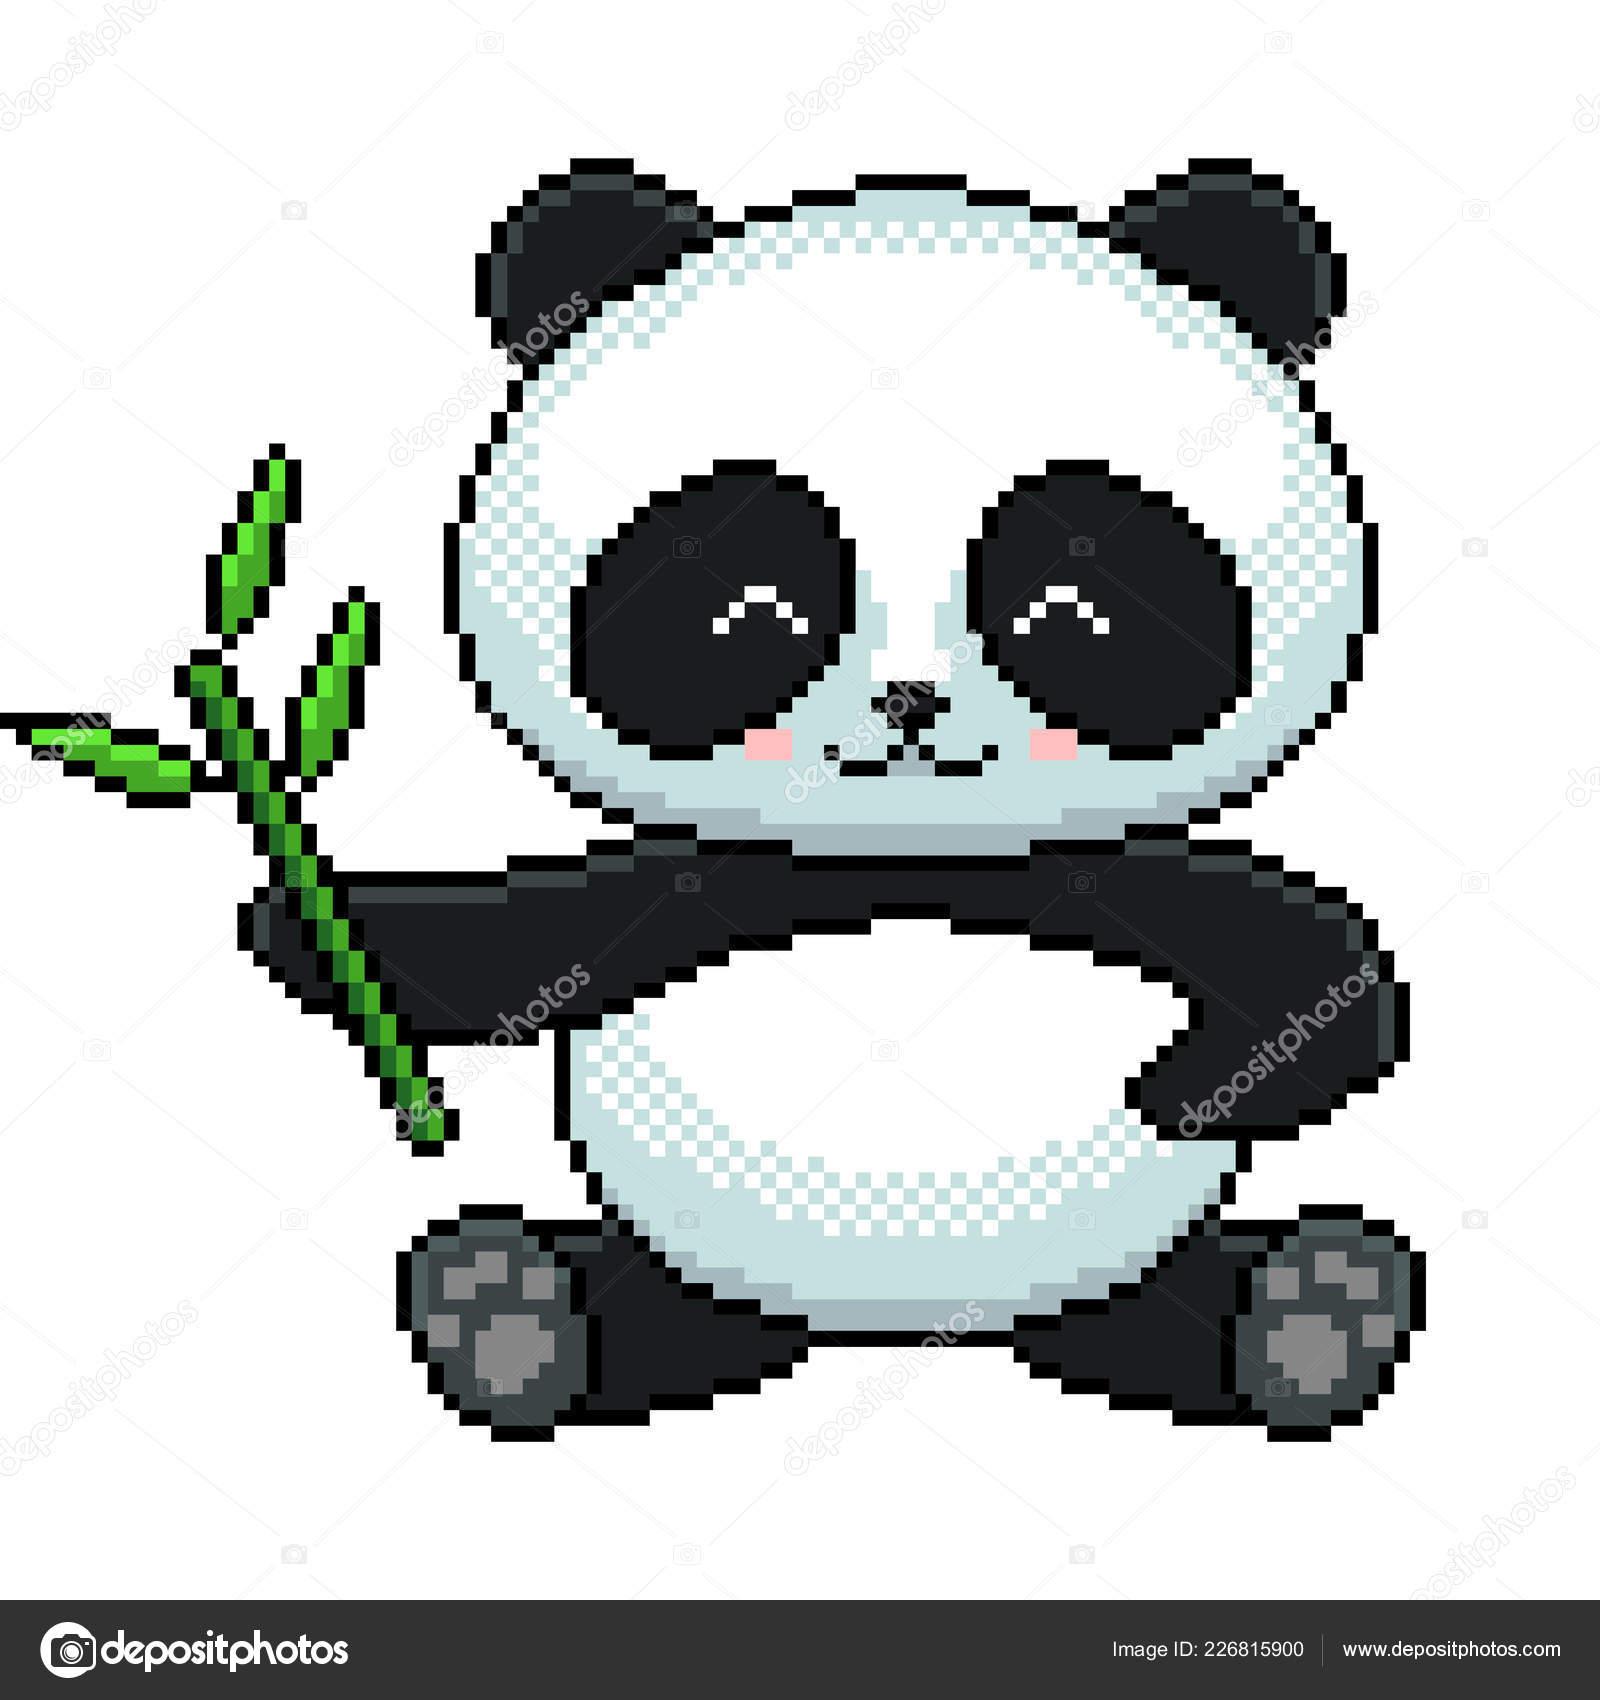 Pixel Art Cute Panda Pixel Art Cute Panda Detailed